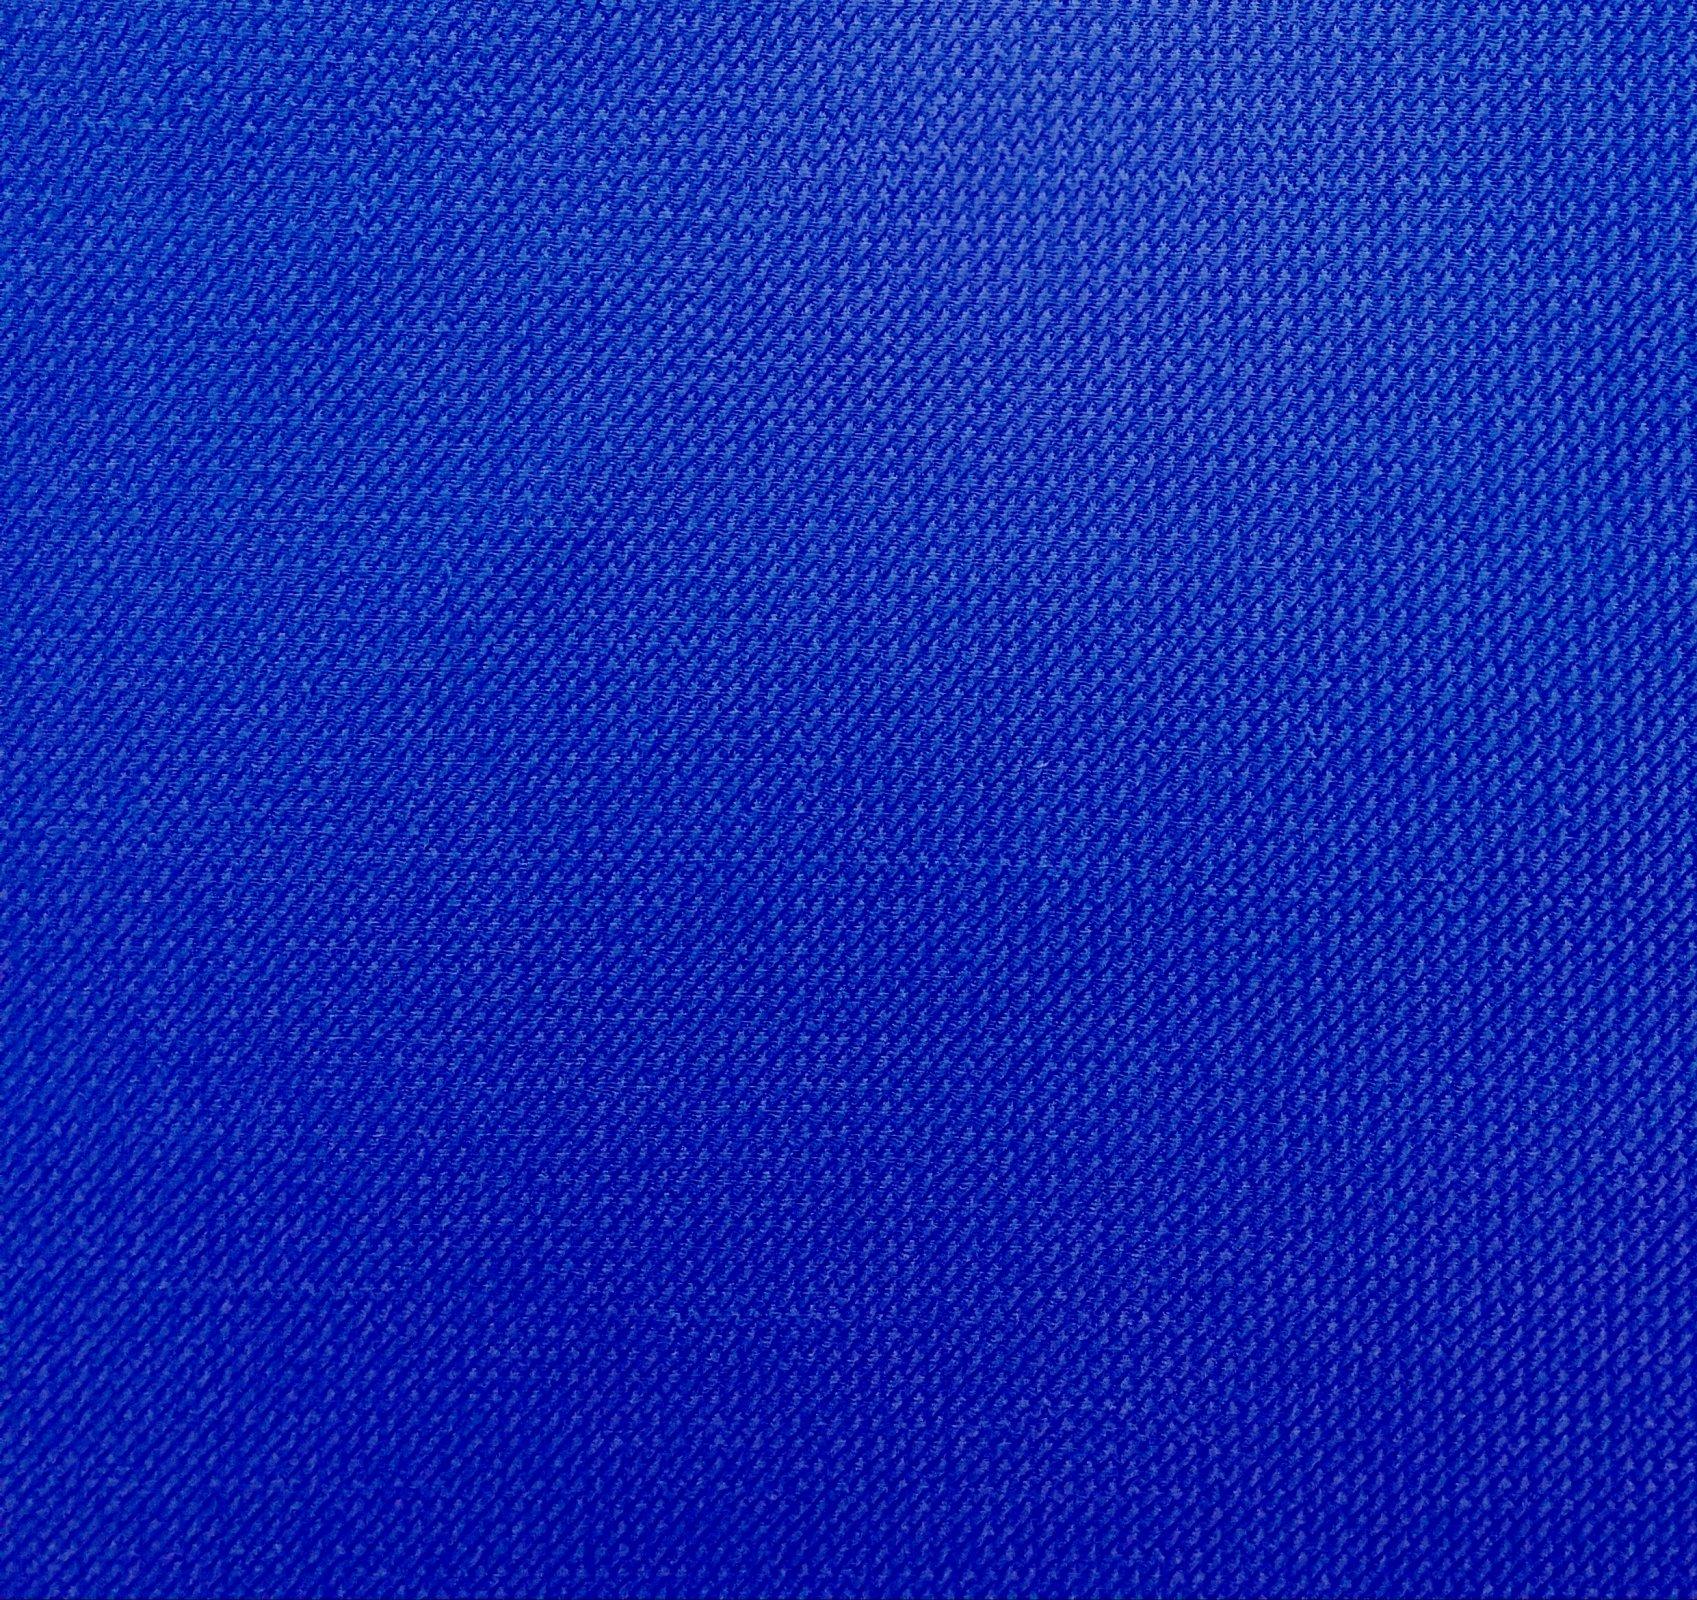 Royal Blue - Paola Pique Knit